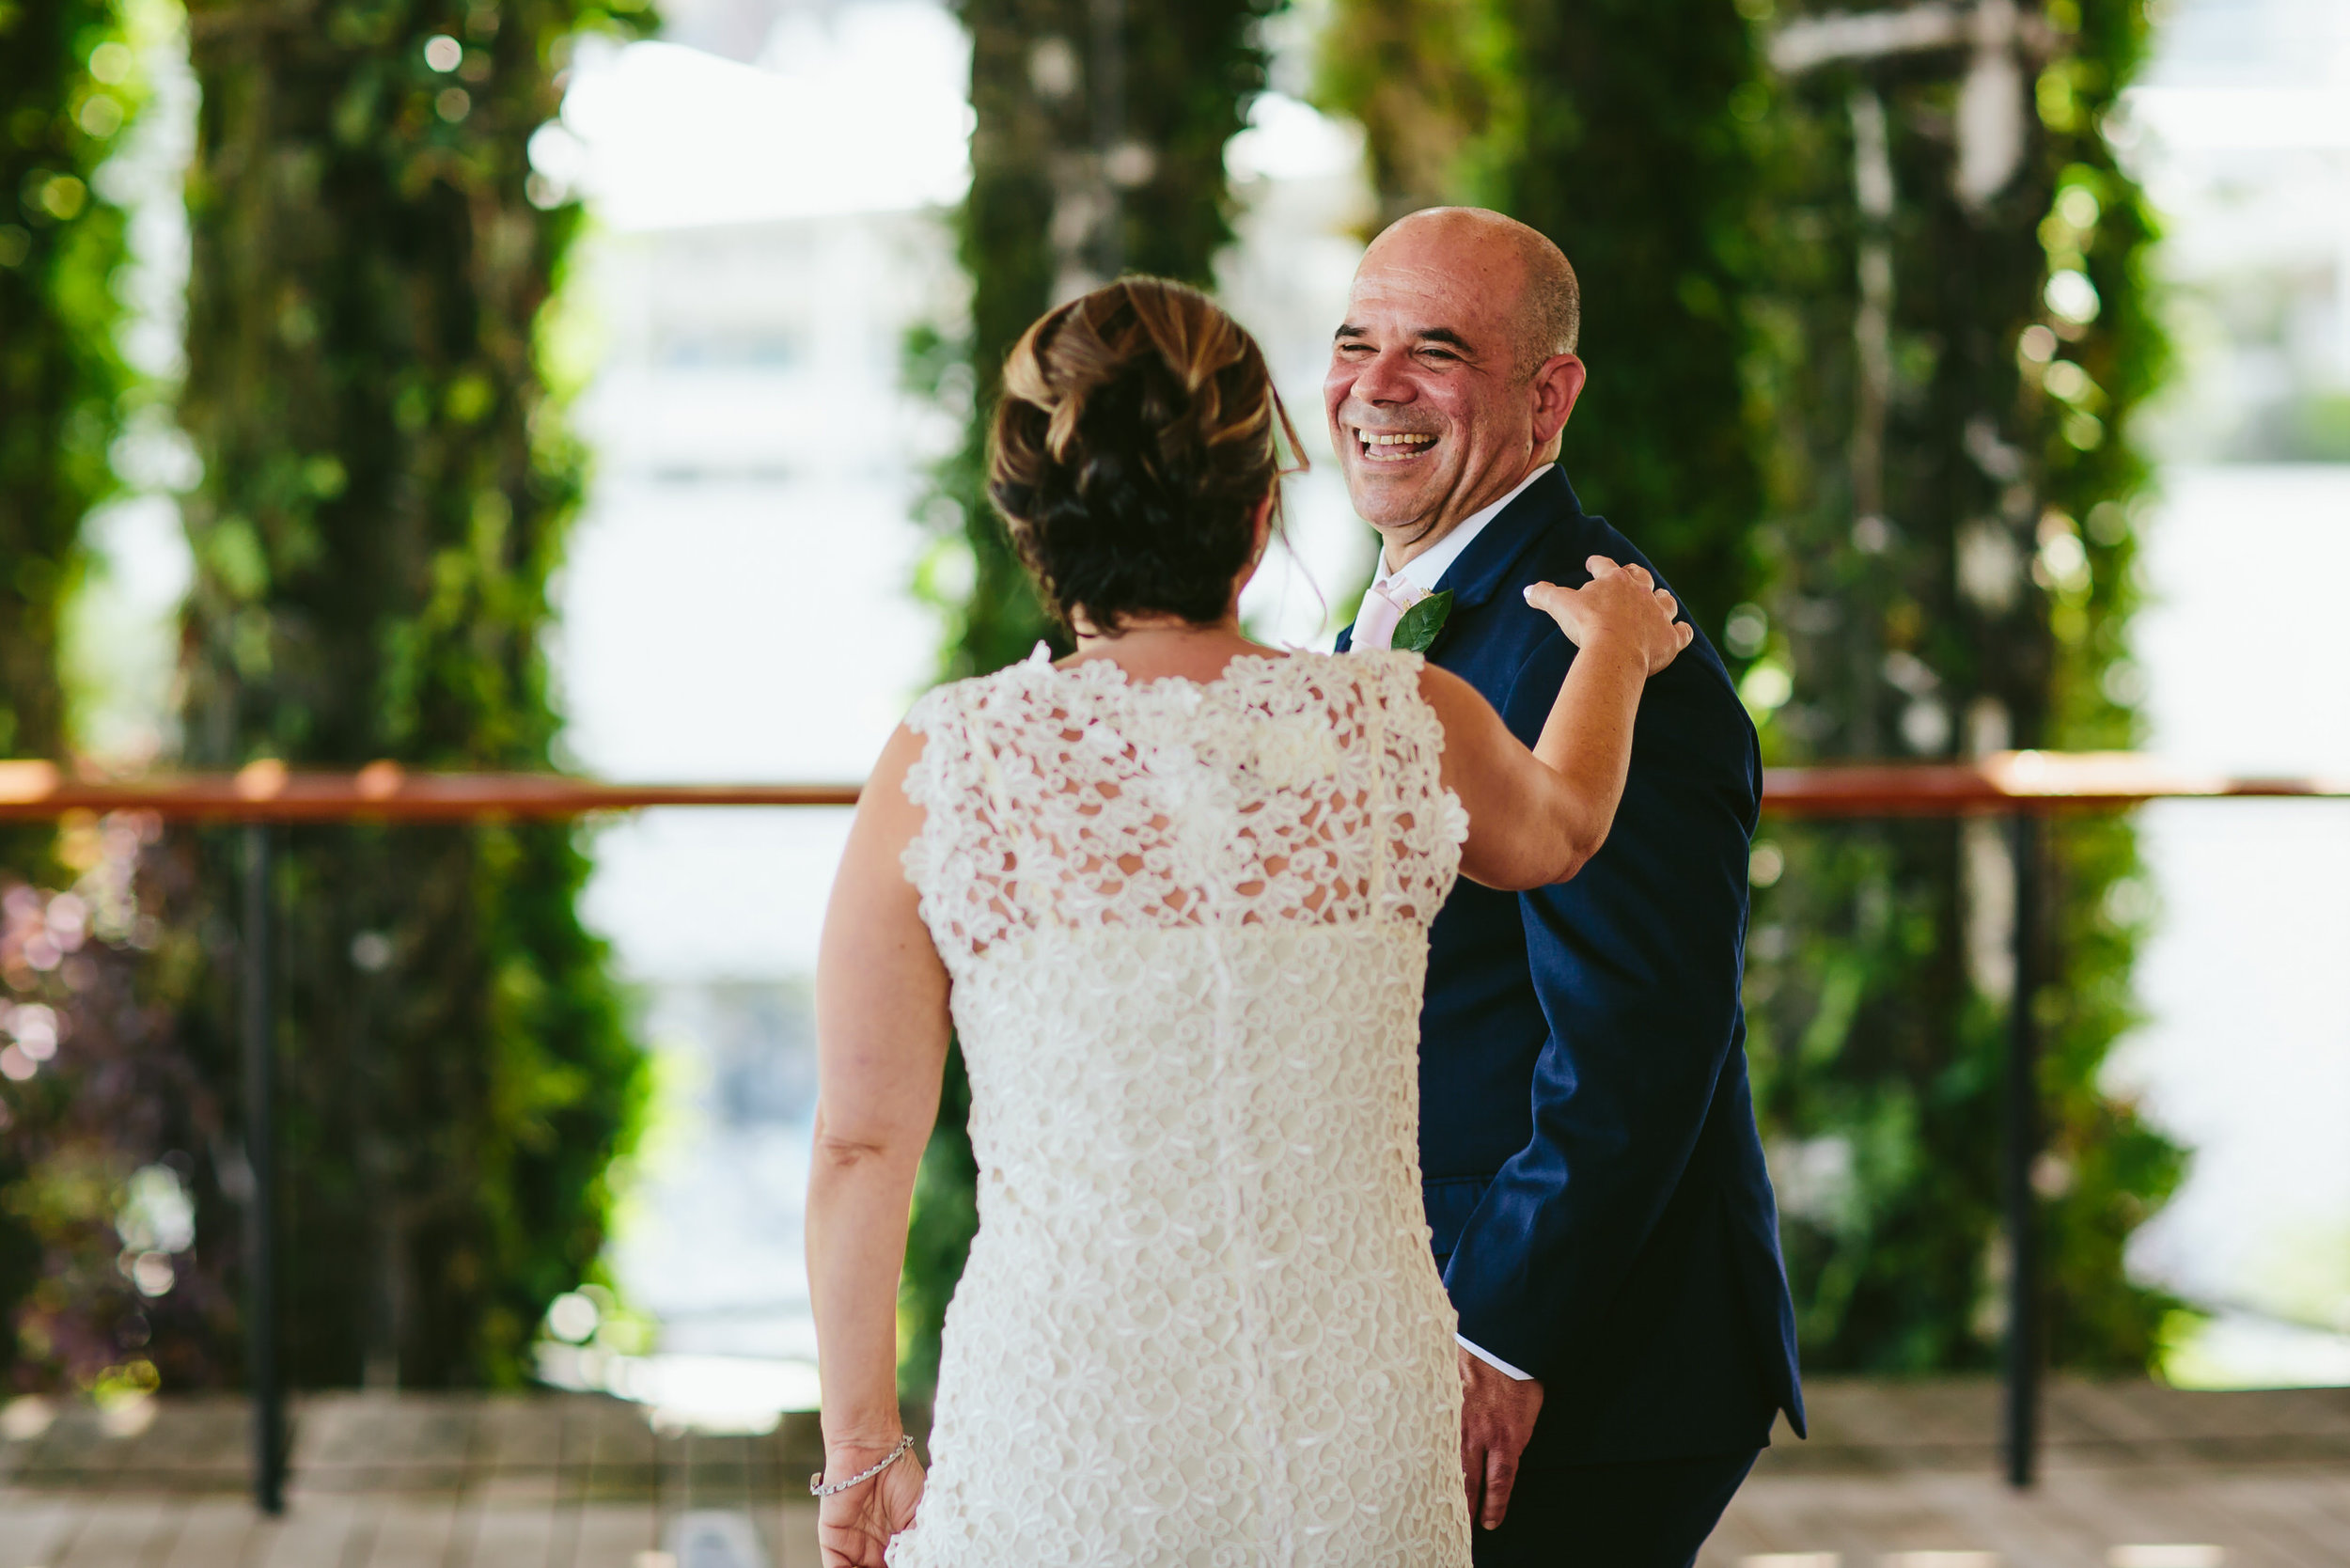 perez_art_museum_wedding_steph_lynn_photo_miami_photographer_first_look-16.jpg